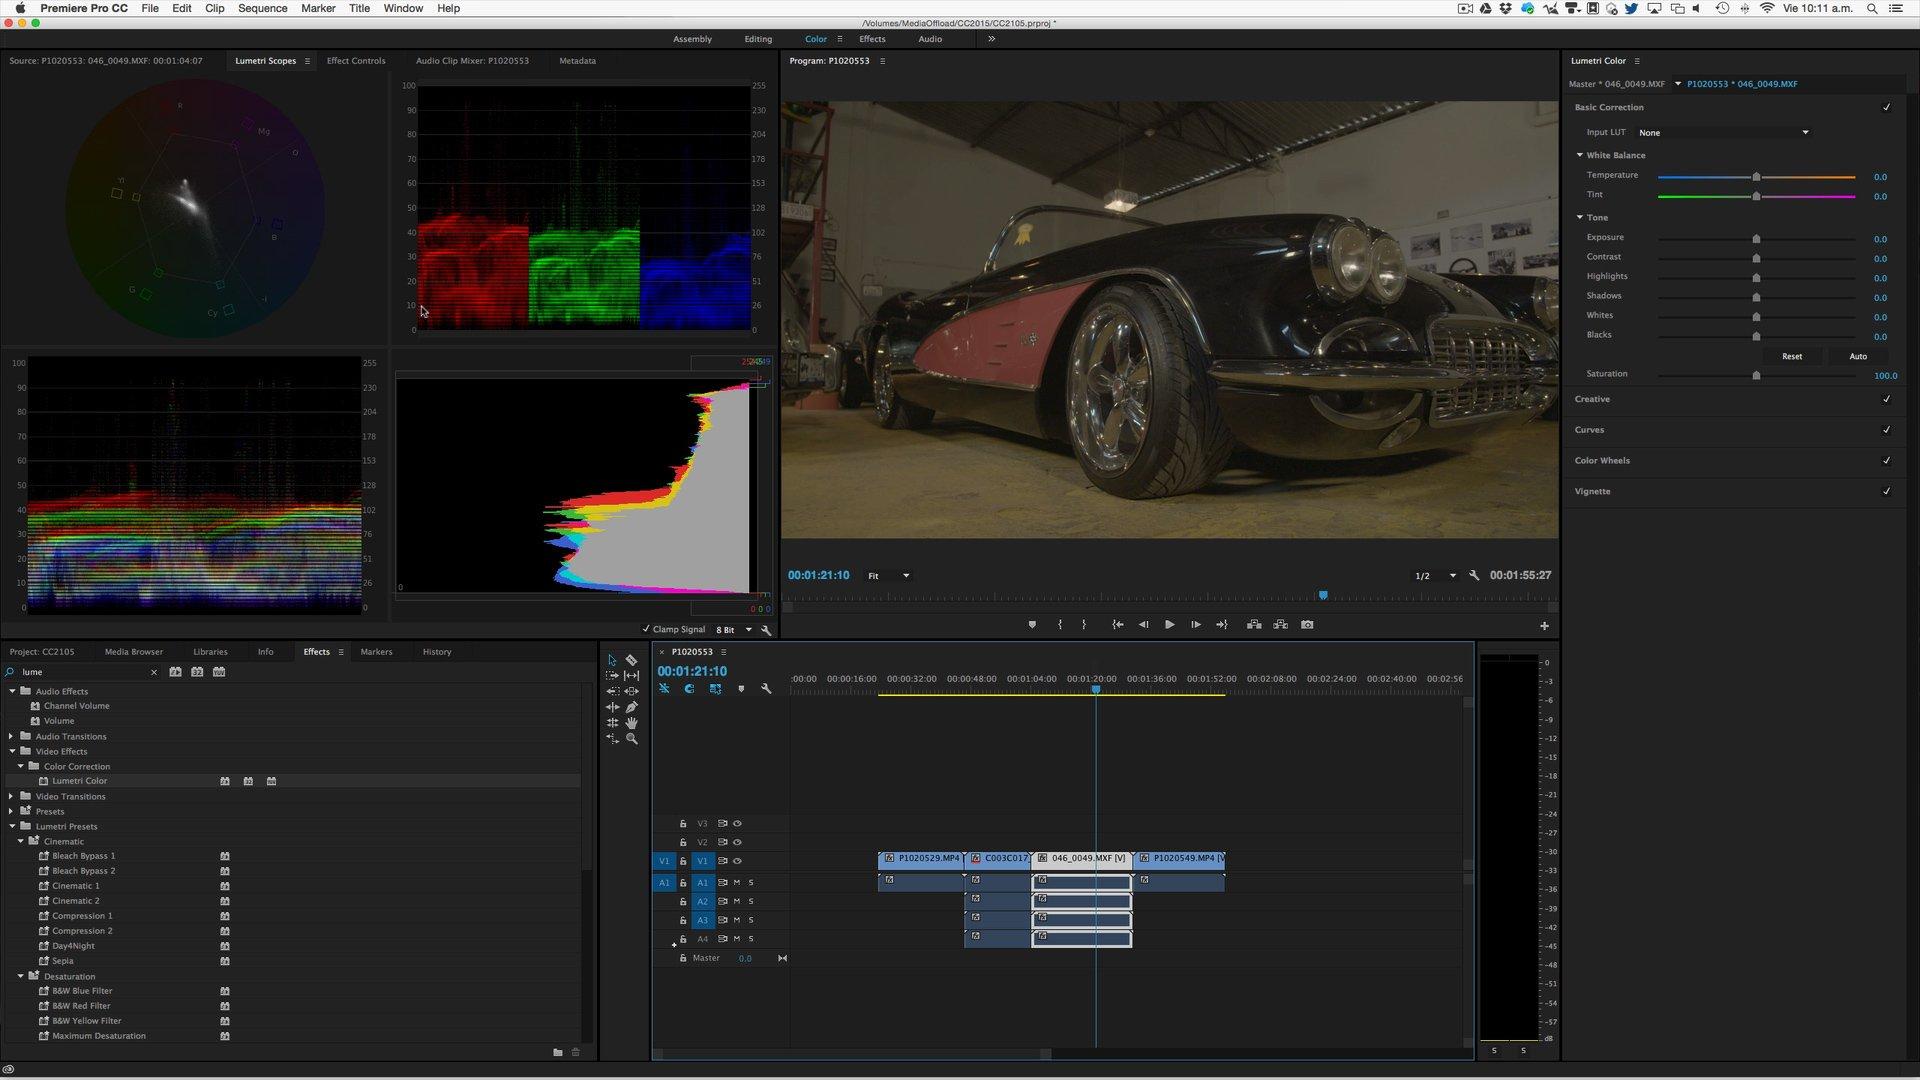 Adobe Premiere CC 2015